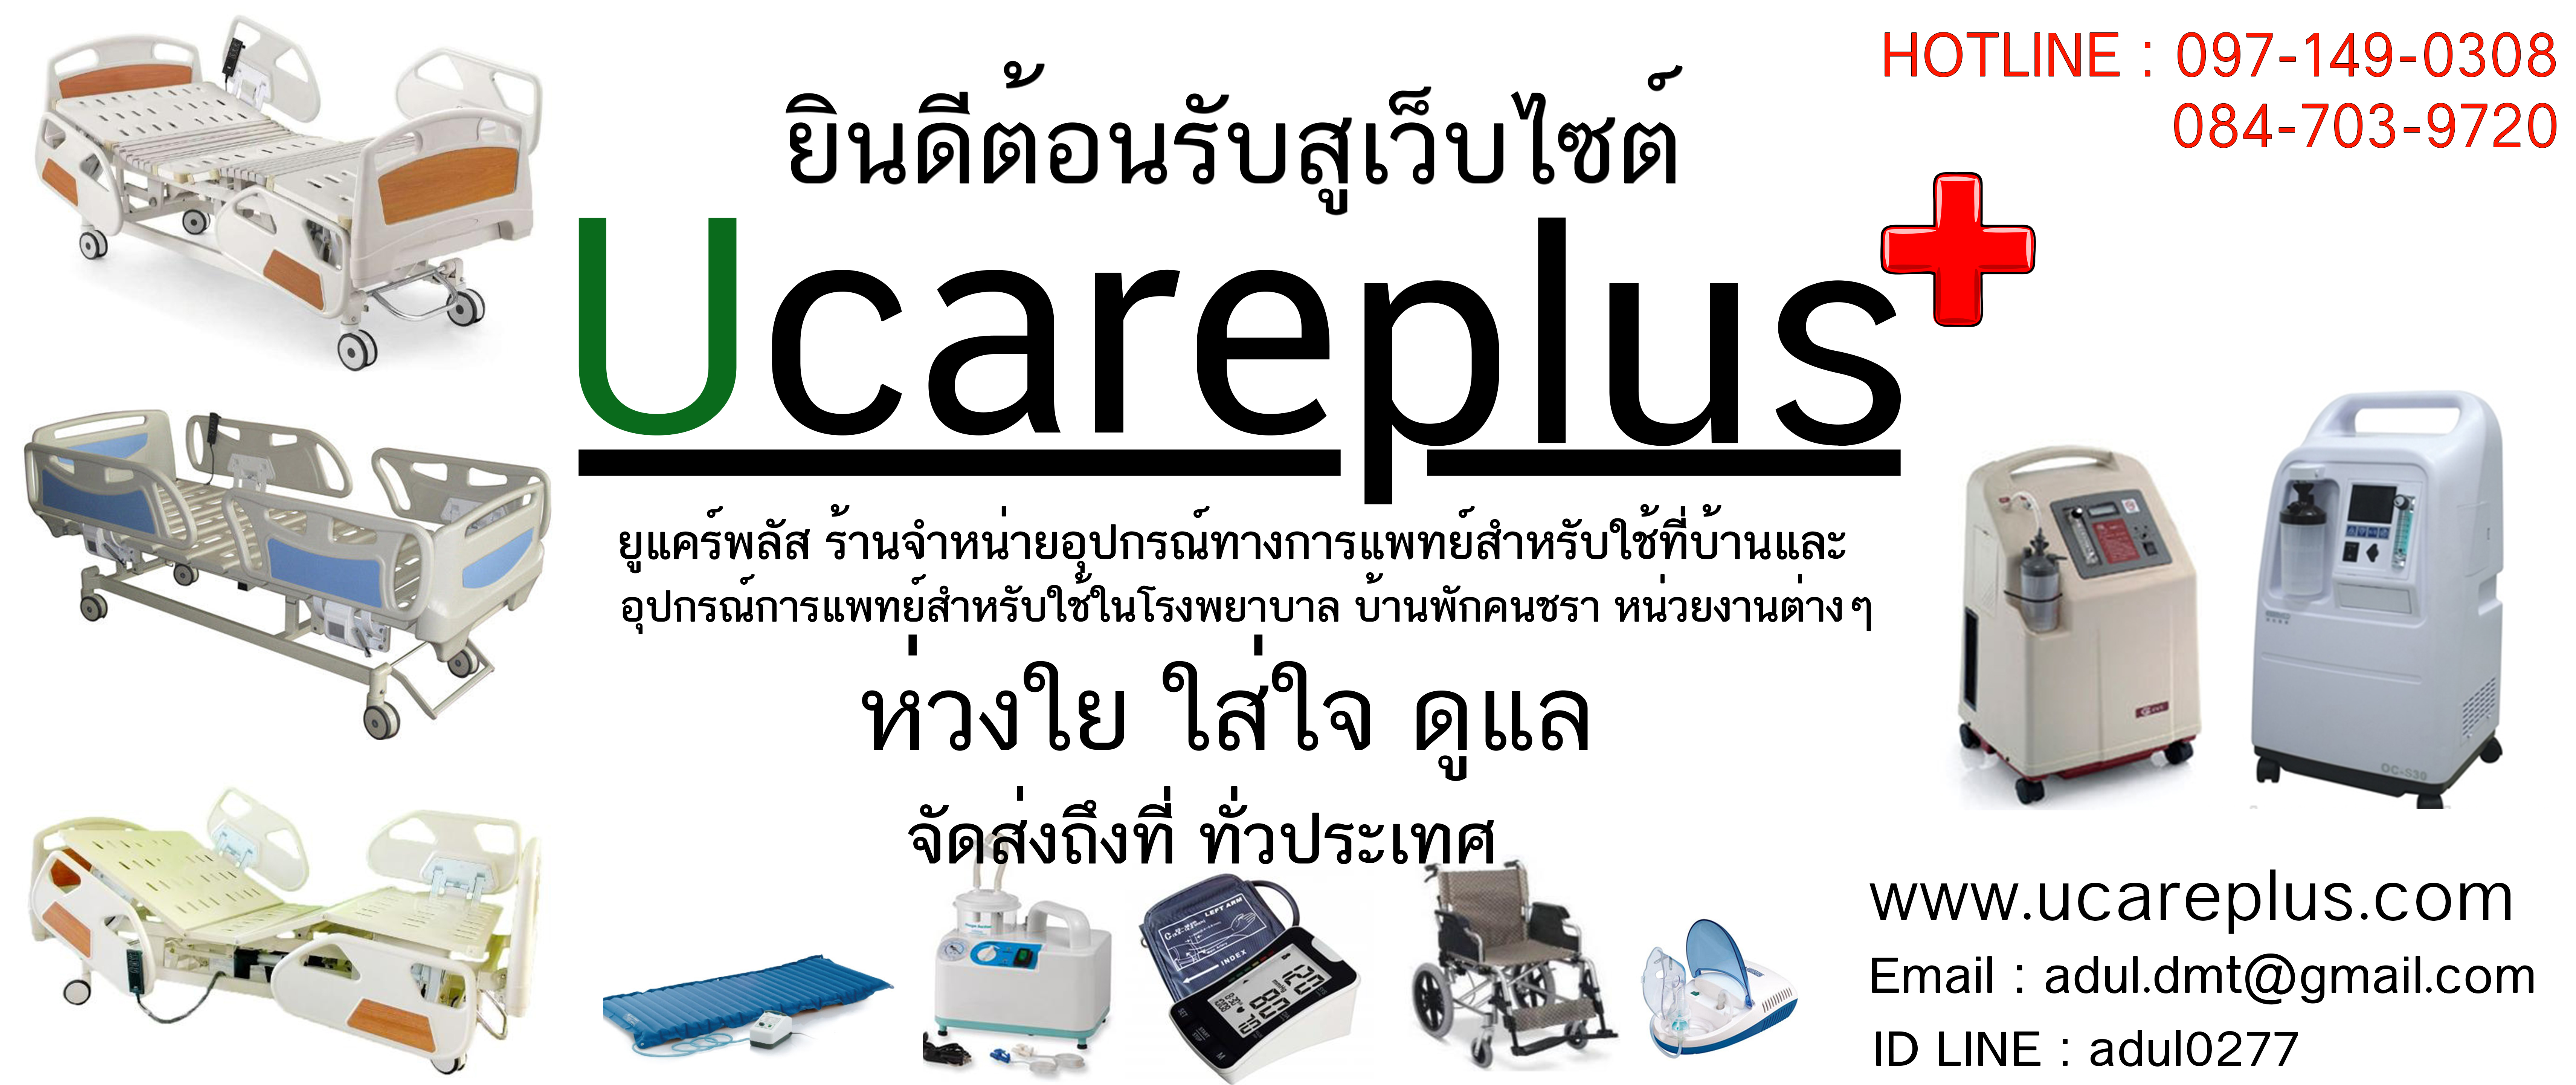 ucareplus